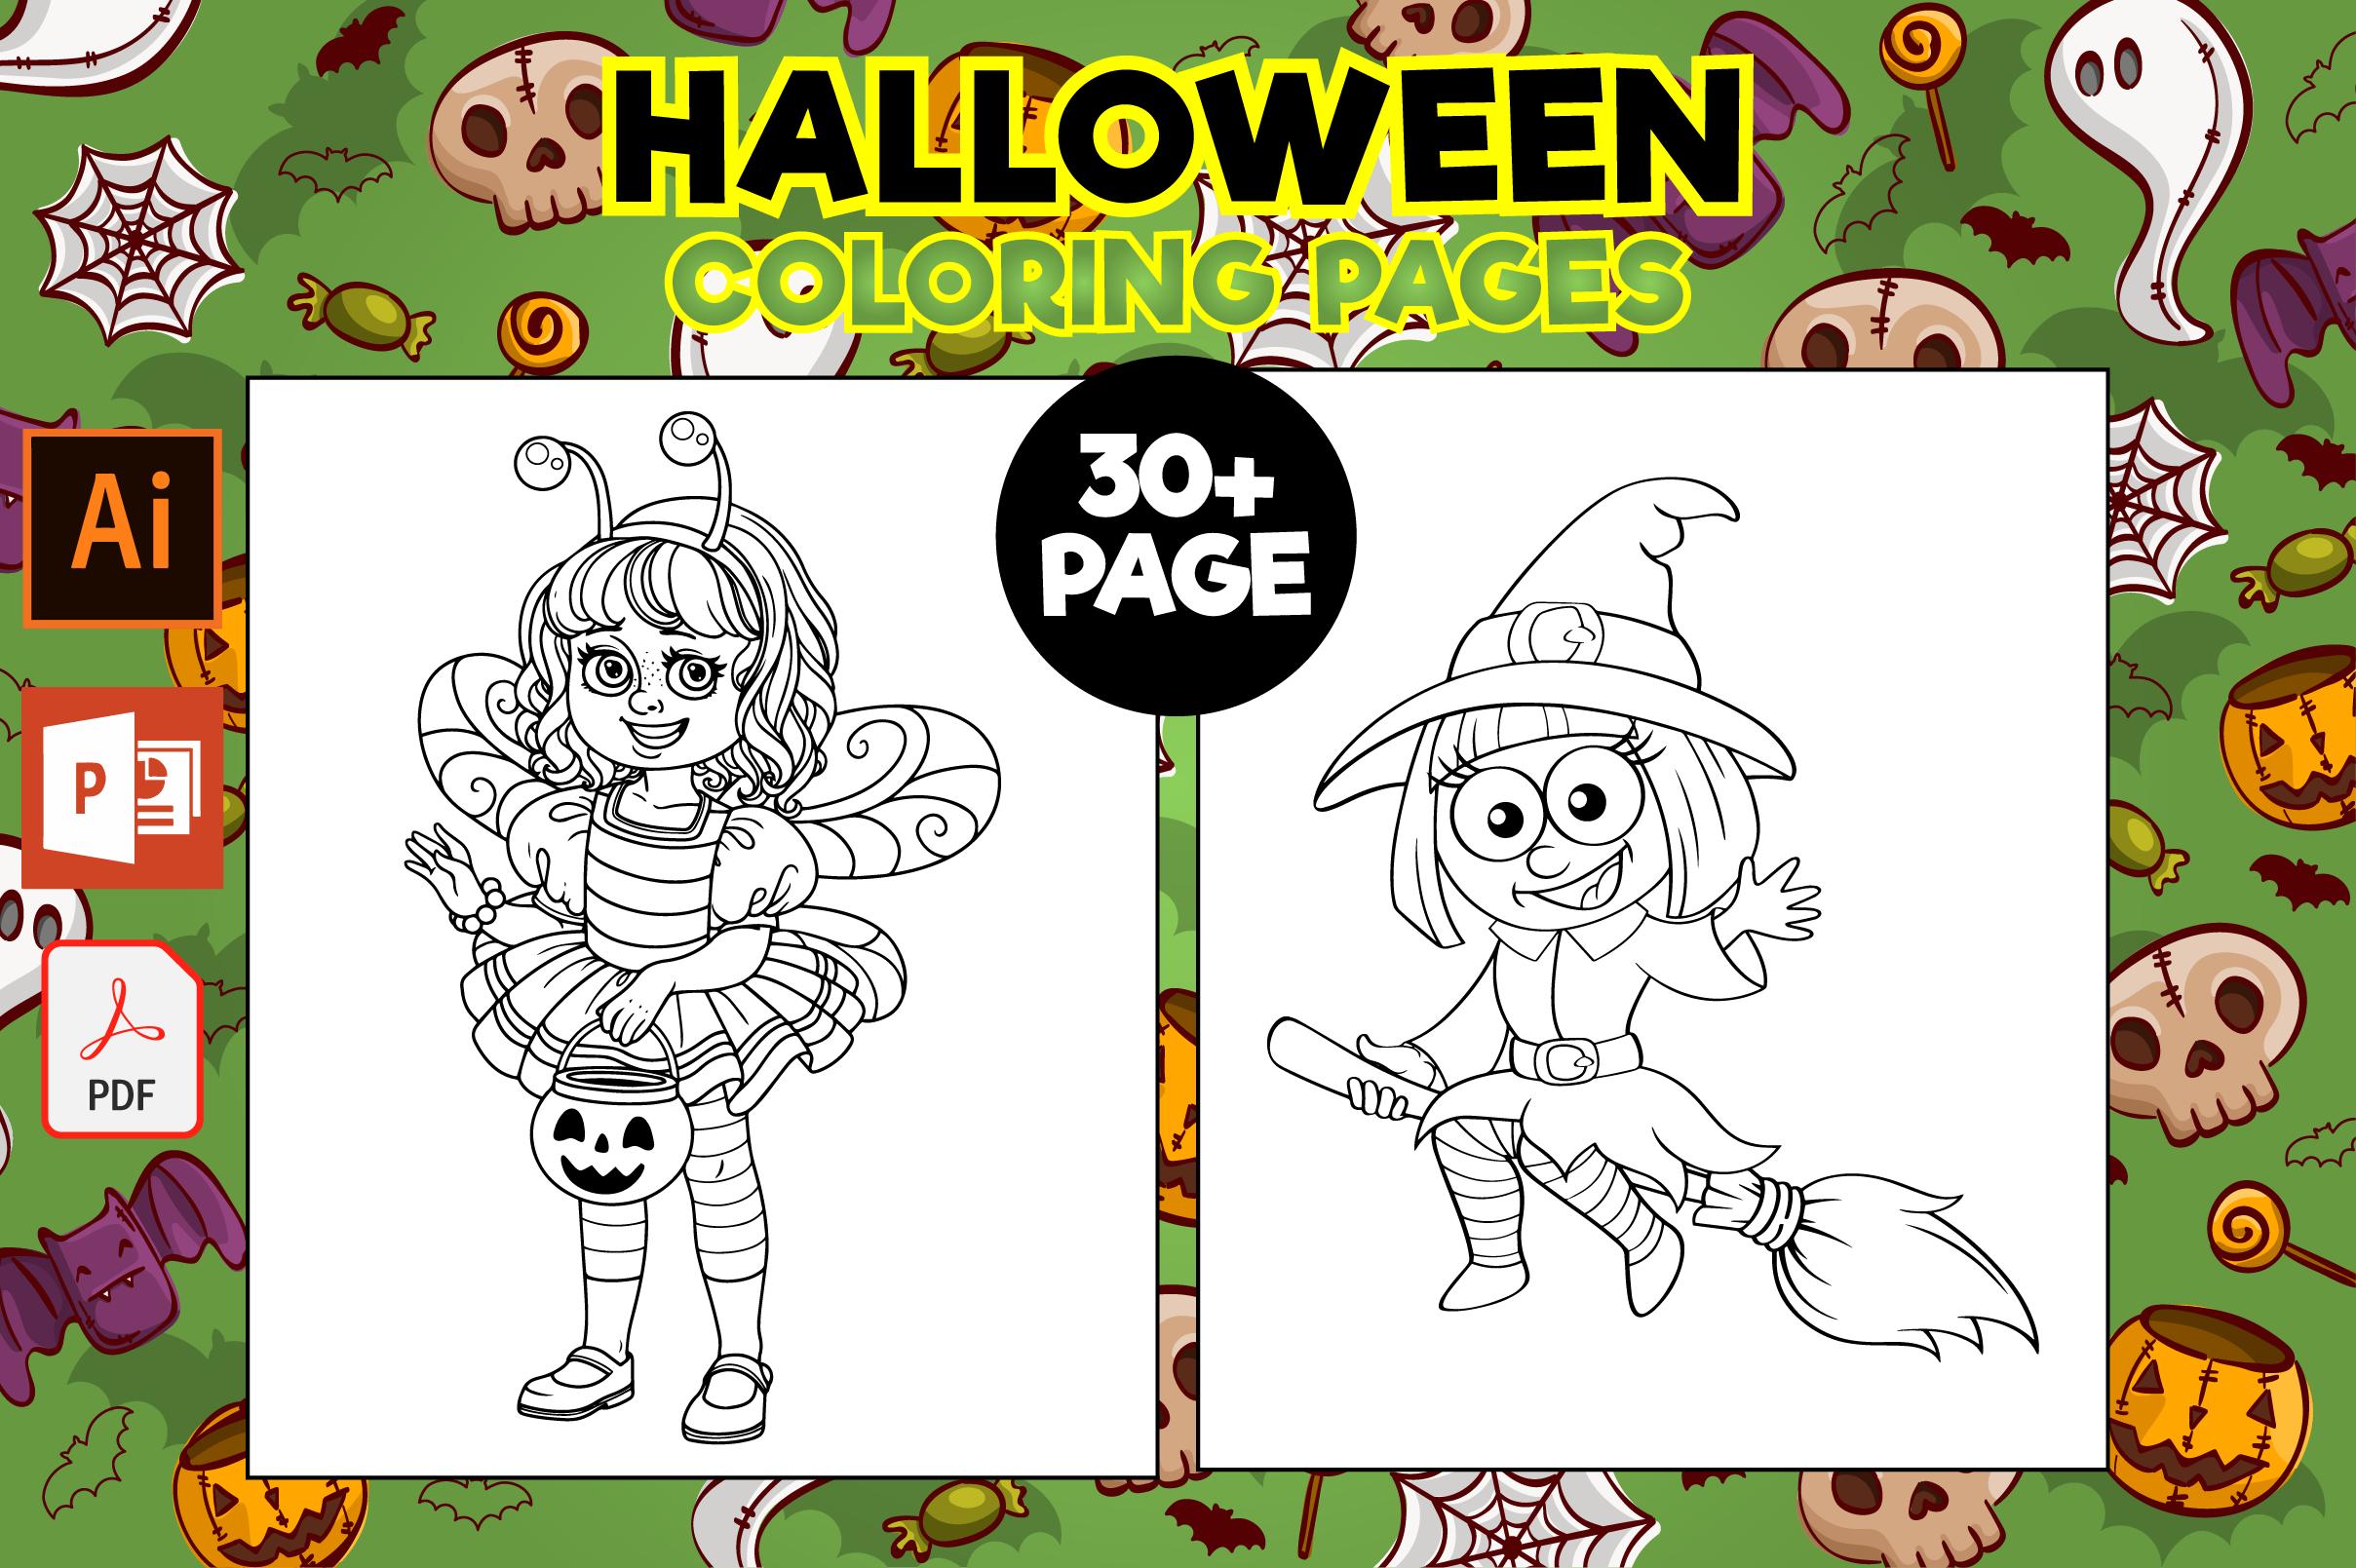 Halloween Coloring Pages Graphic By Mk Designs Creative Fabrica Malvorlagen Halloween